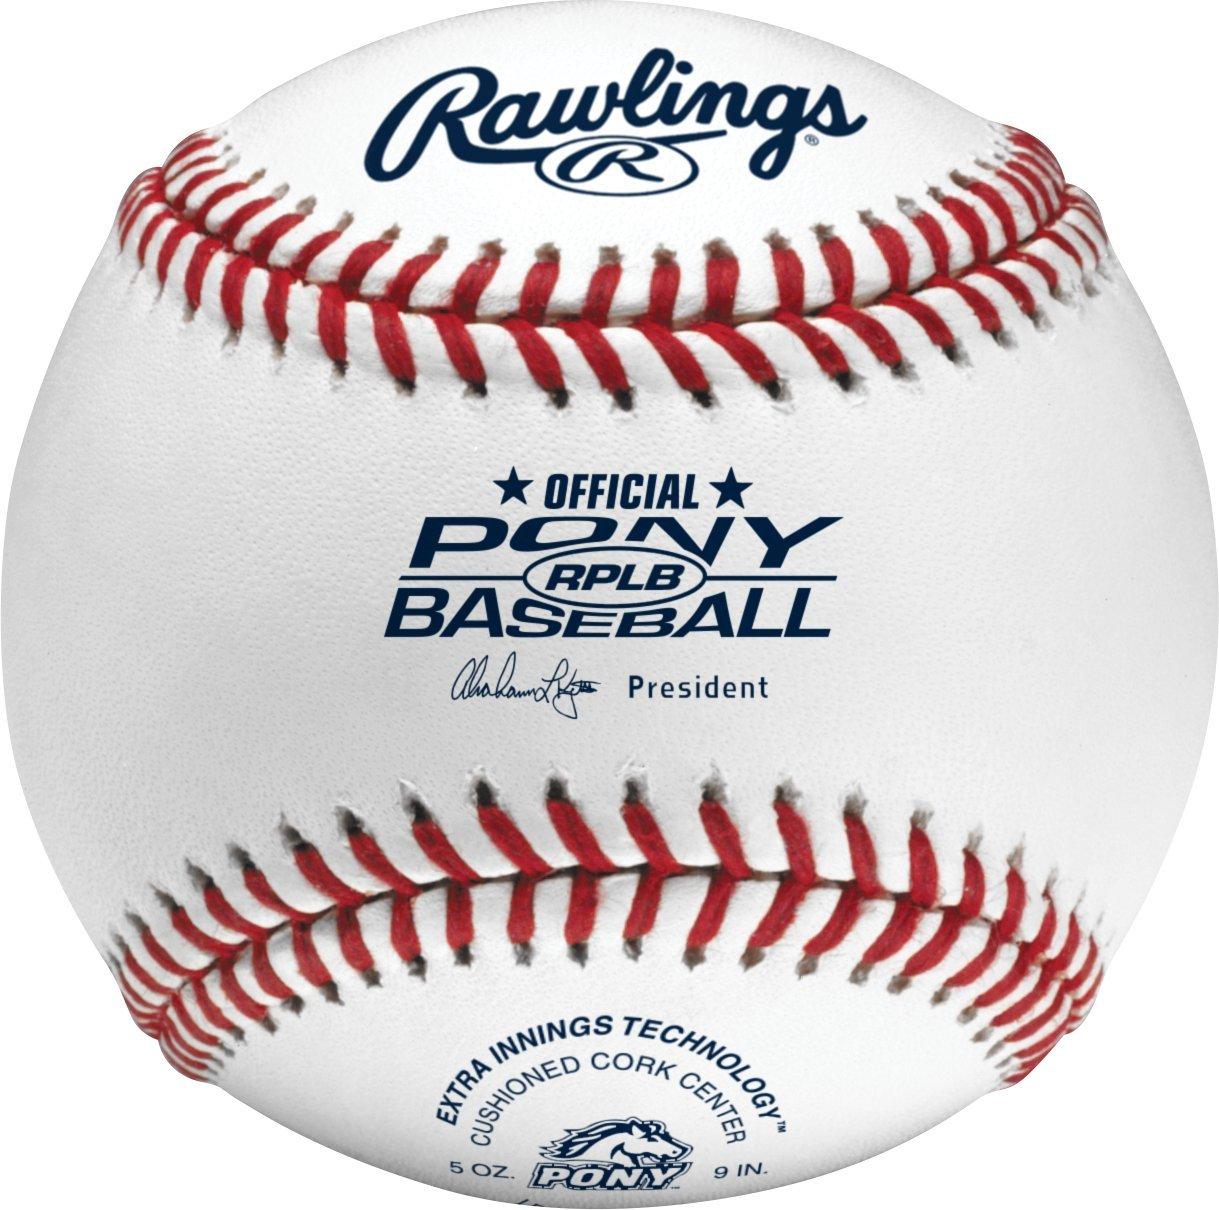 Rawlings Pony League Play Baseballs, (Box of 24), R14UPLSW2-24